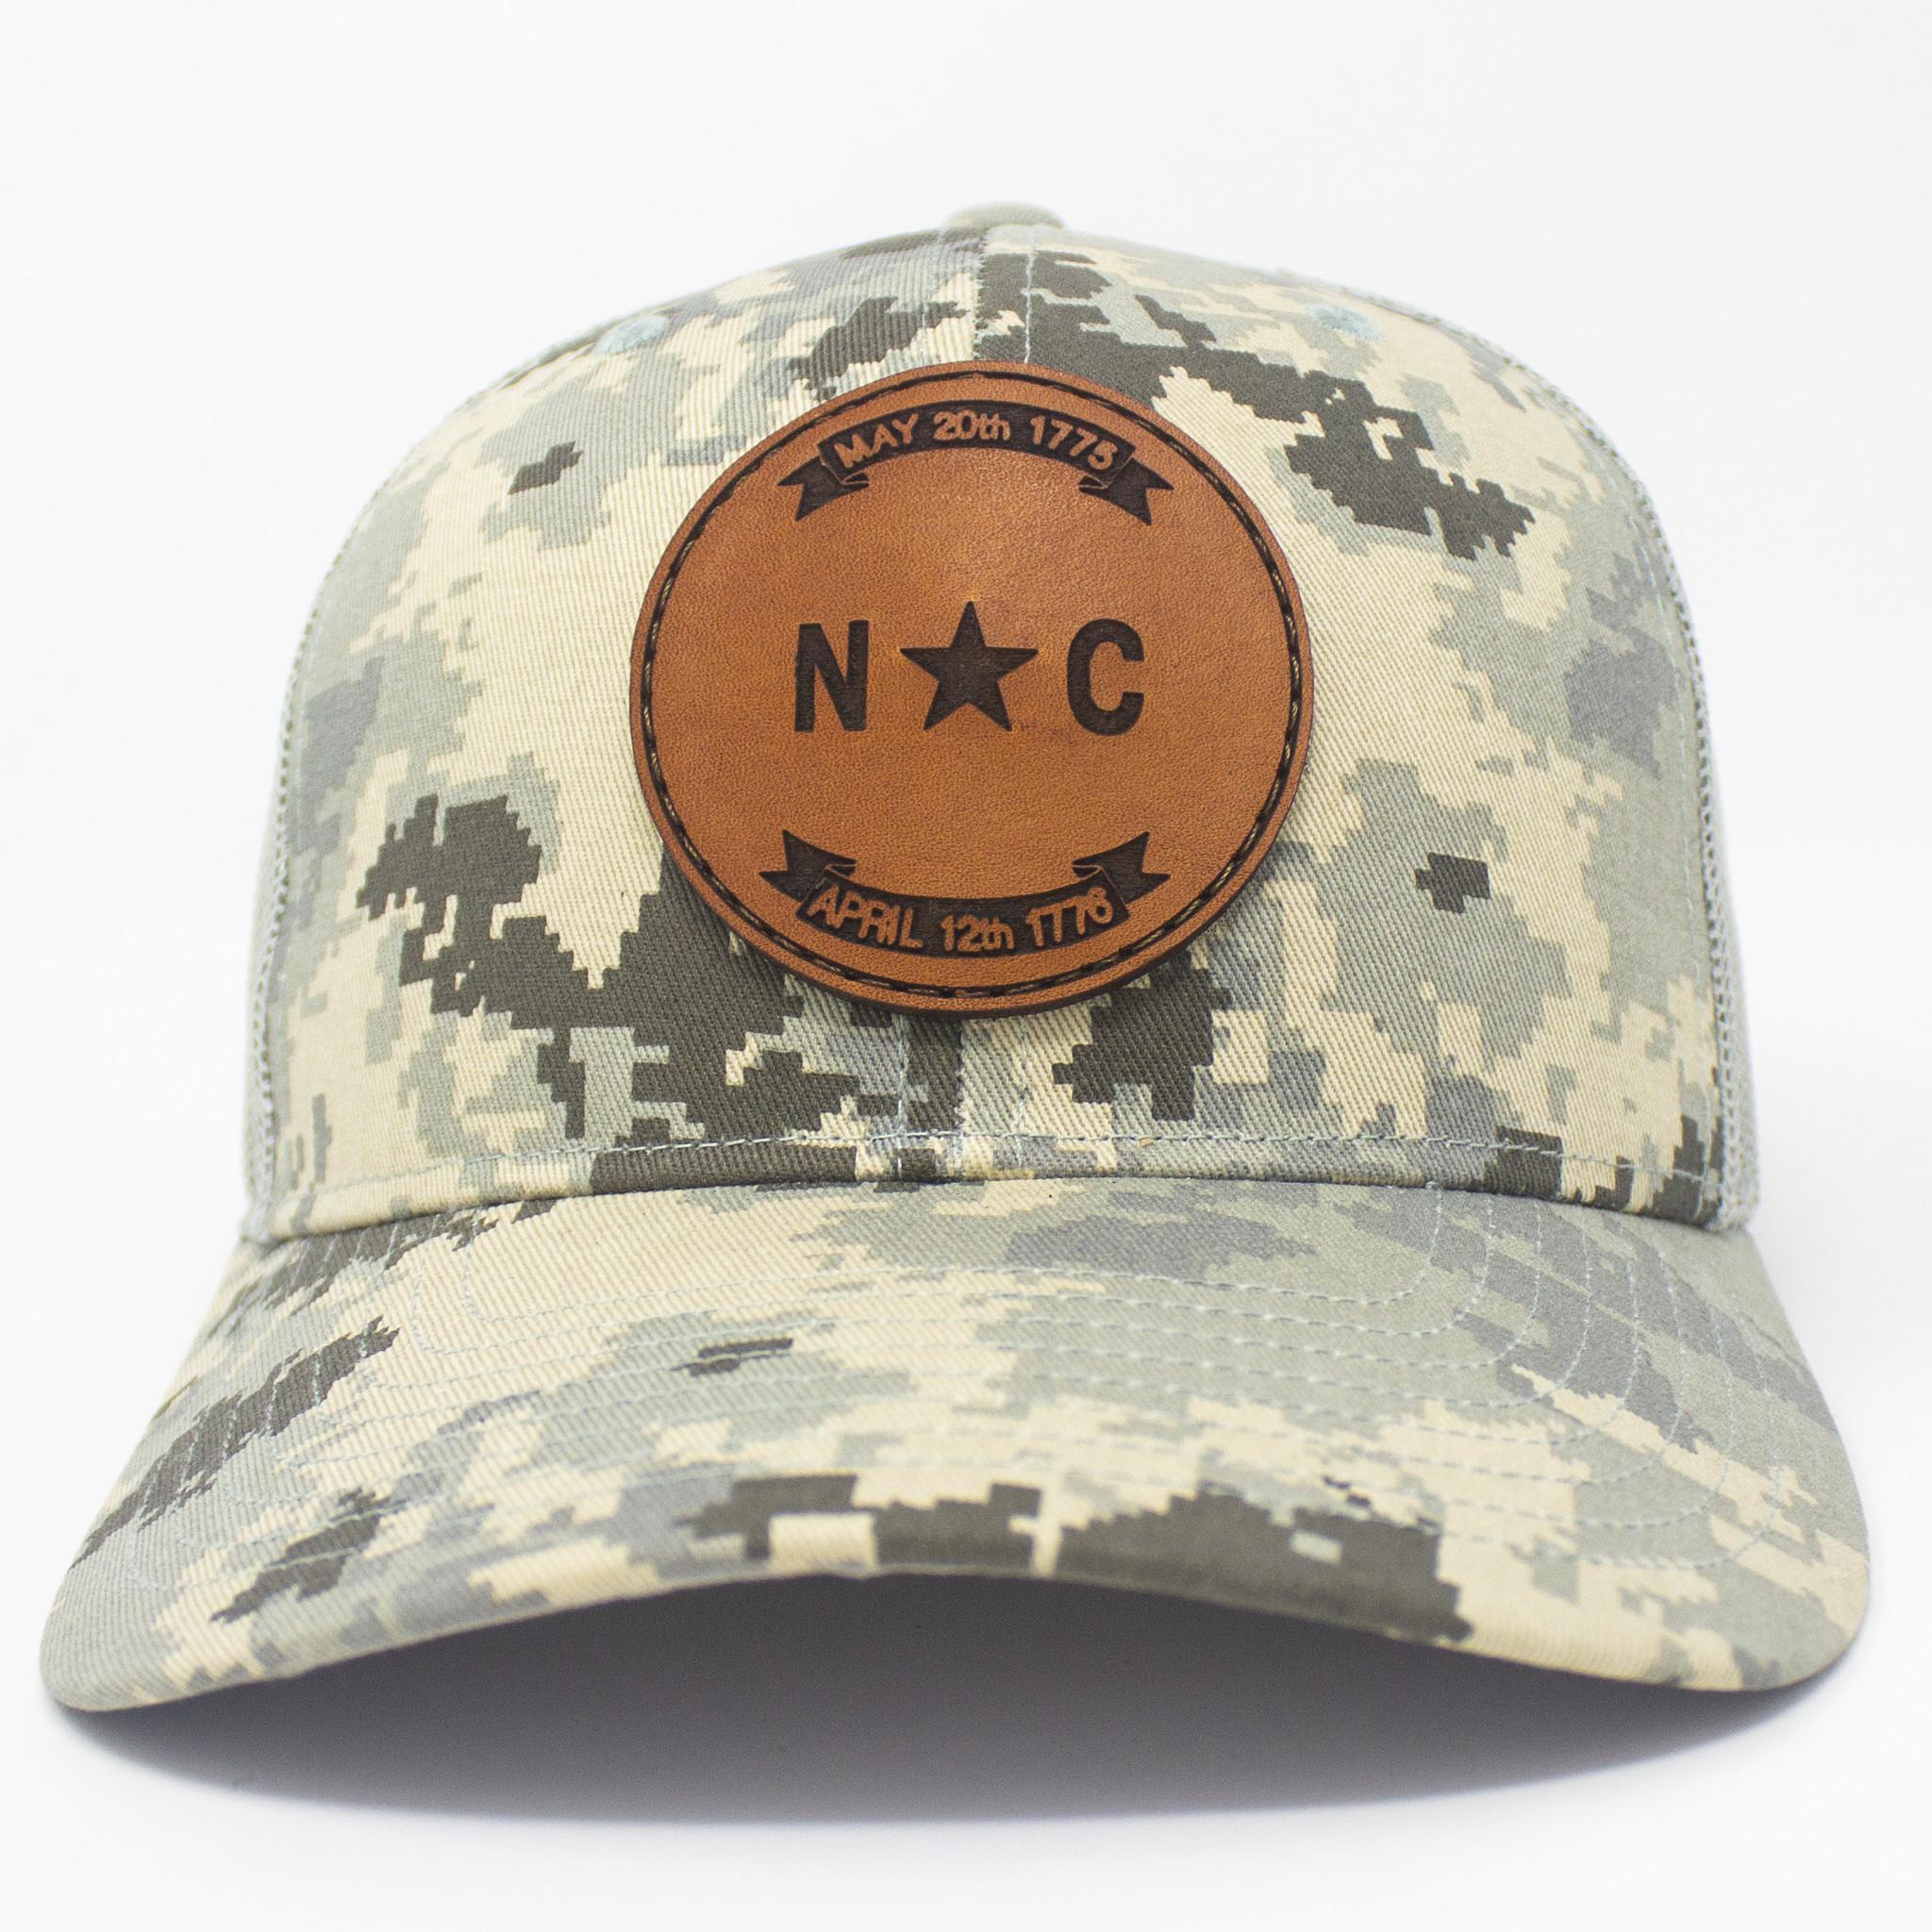 North Carolina Flag Patch Trucker Hat Military Digital Camo/Light Green-3